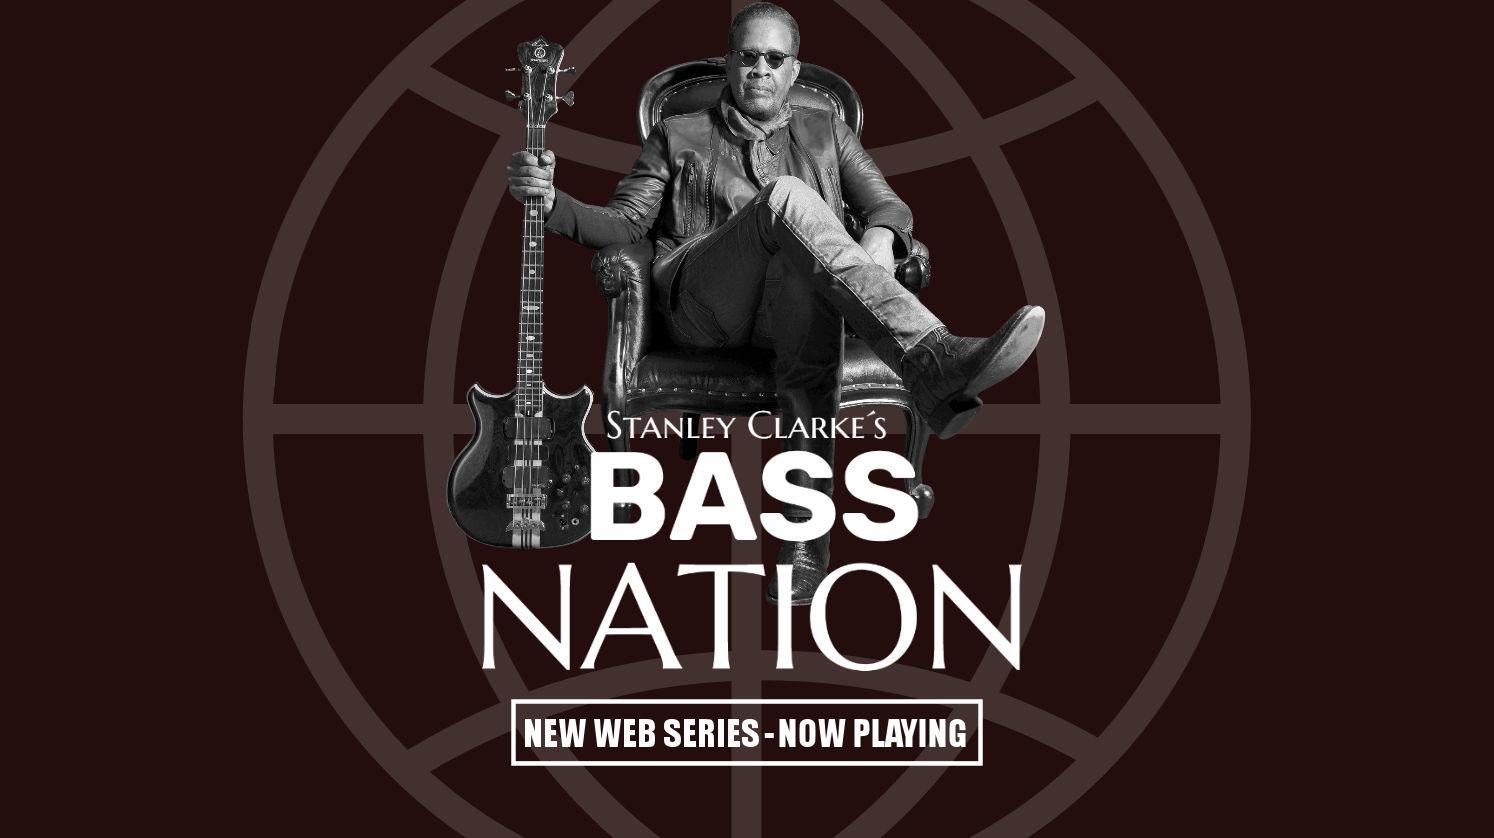 Stanley Clarke's Bass Nation